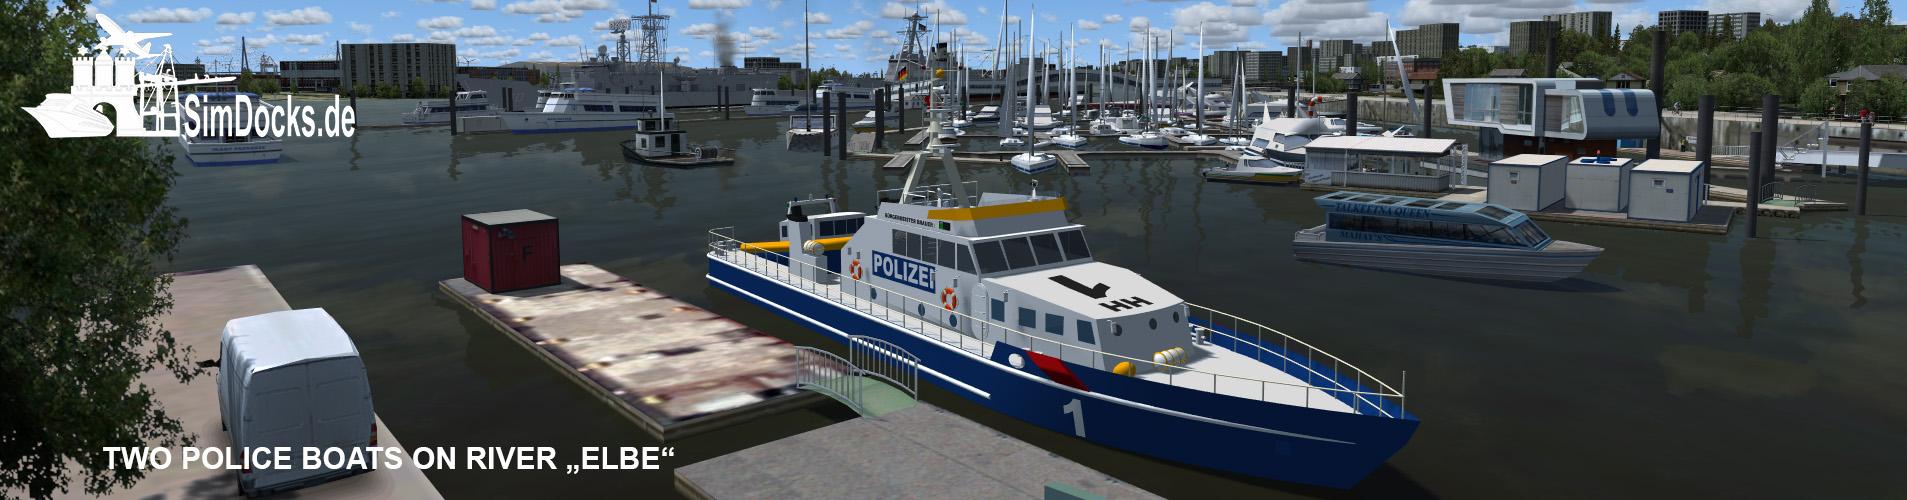 Headpic_hh-policeboats.jpg